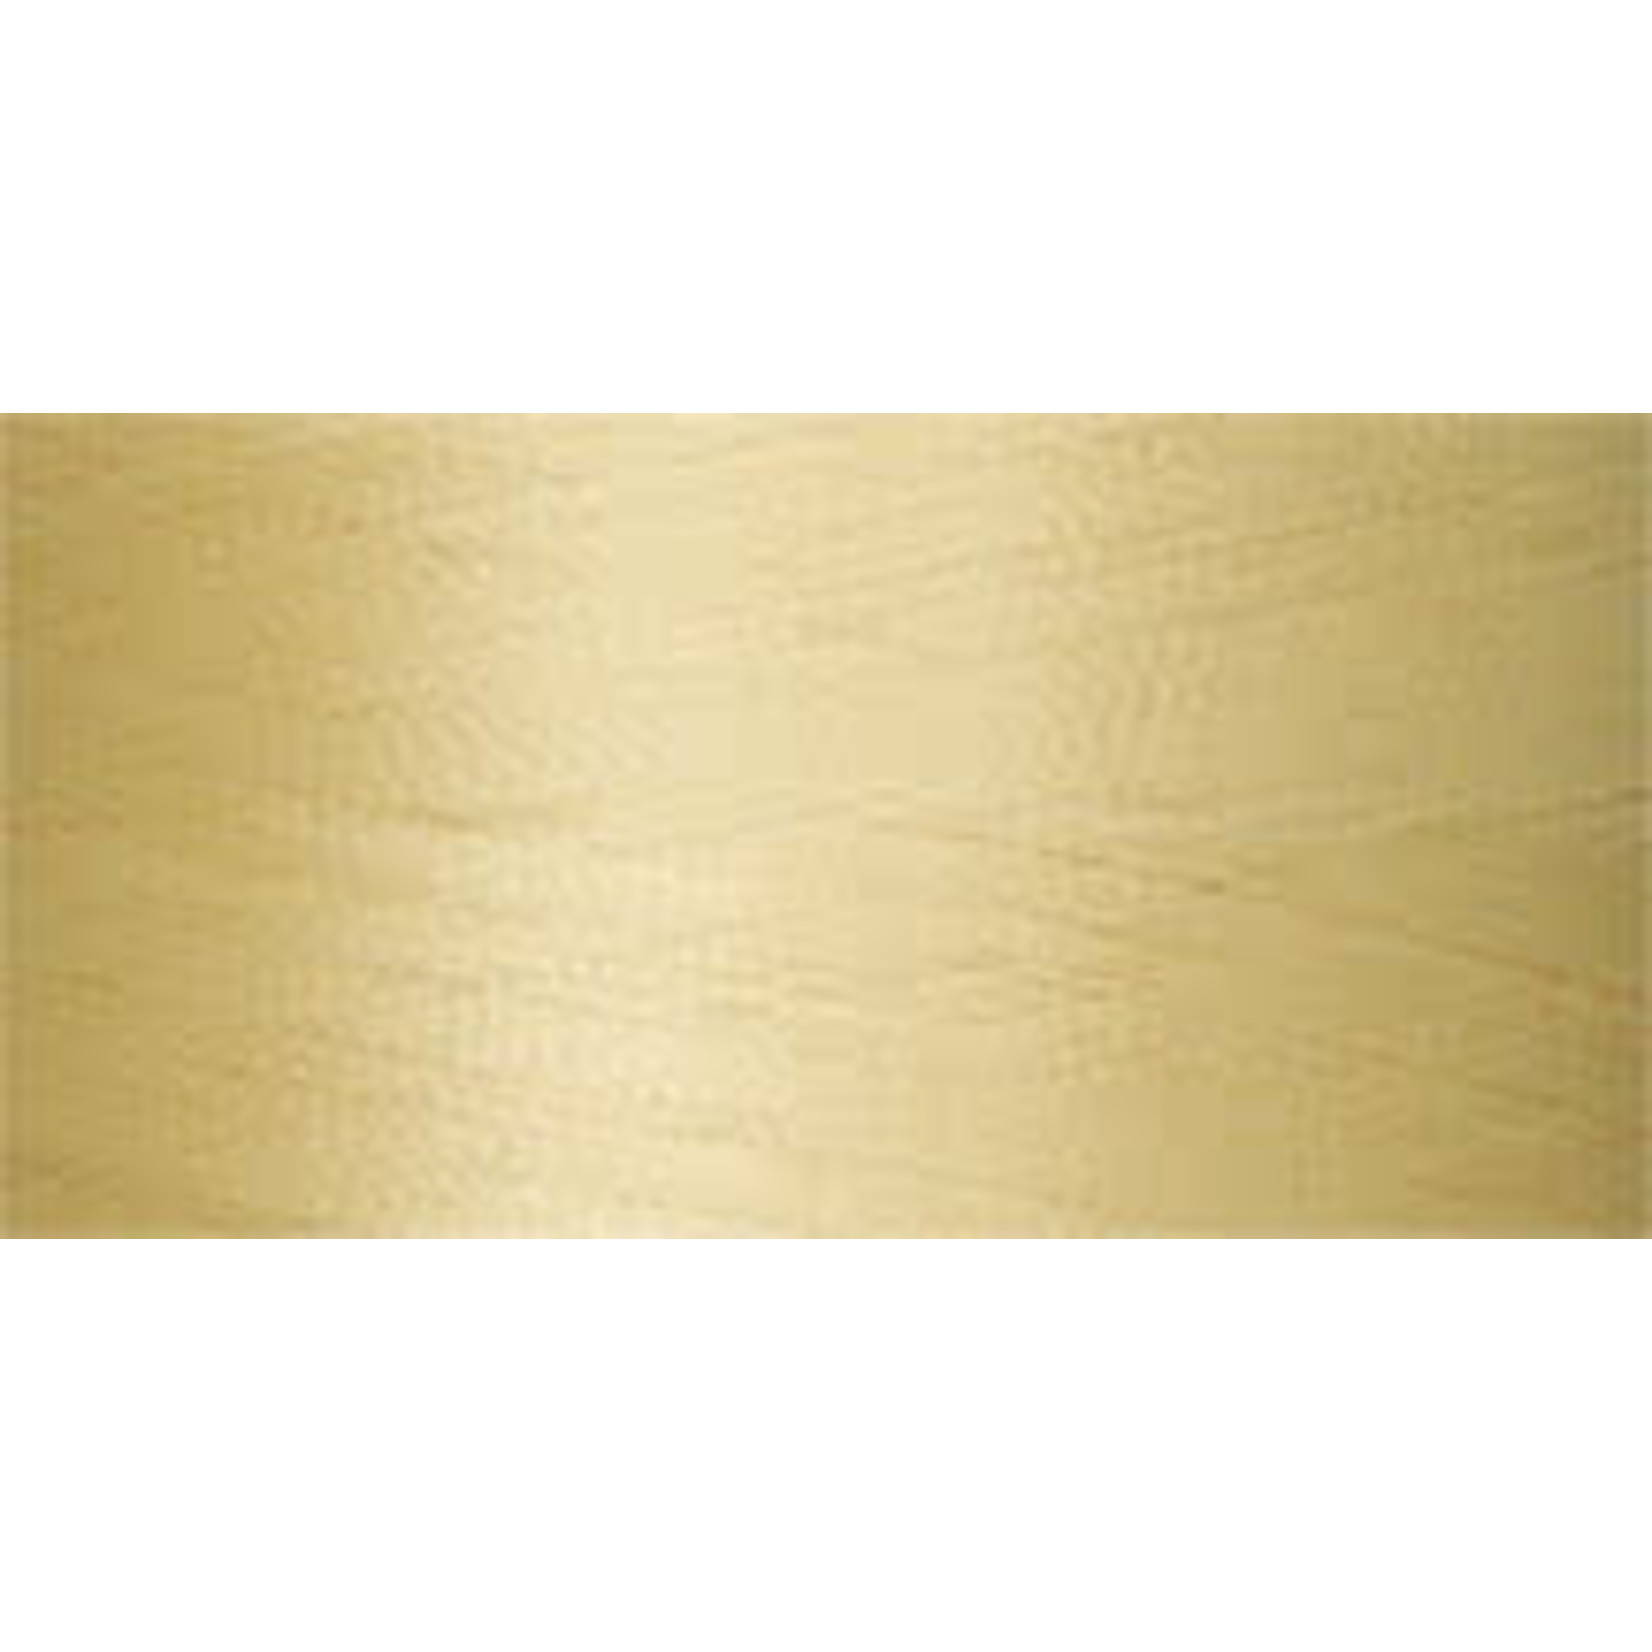 Superior Threads Bottom Line - #60 - 1300 m - 619 Tan